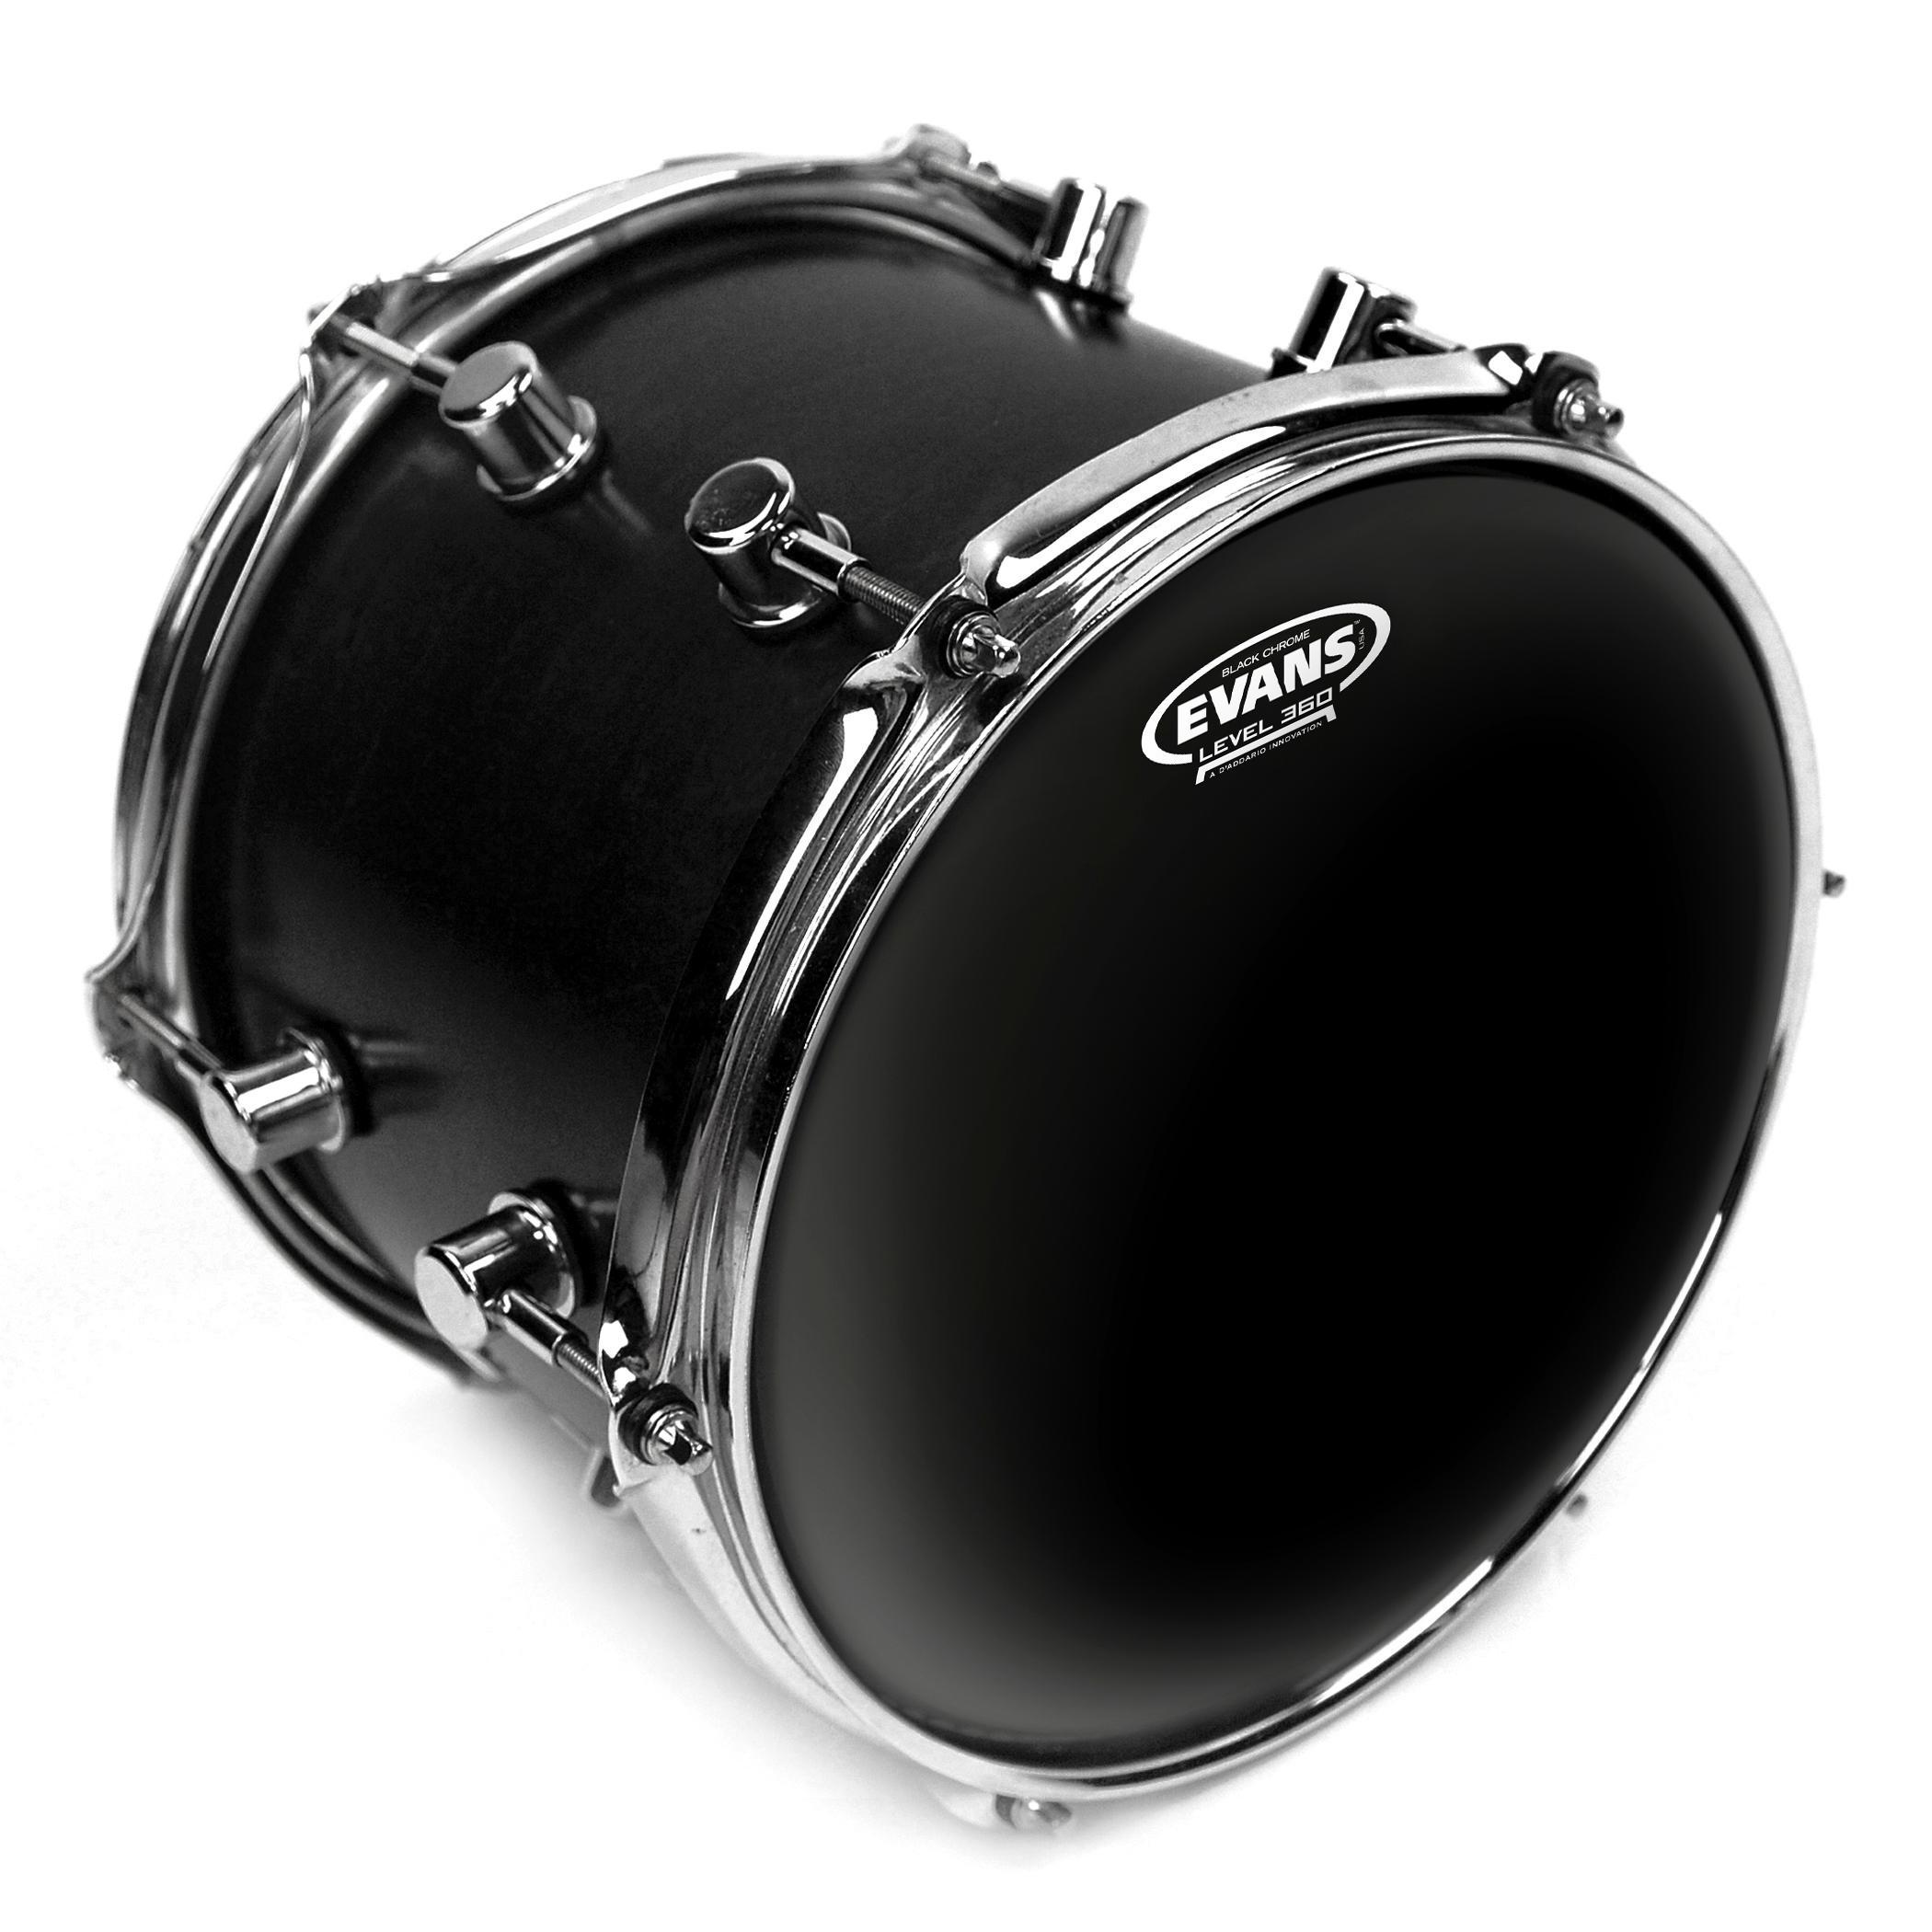 Amazon.com: Evans Black Chrome Drum Head, 10 Inch: Musical Instruments